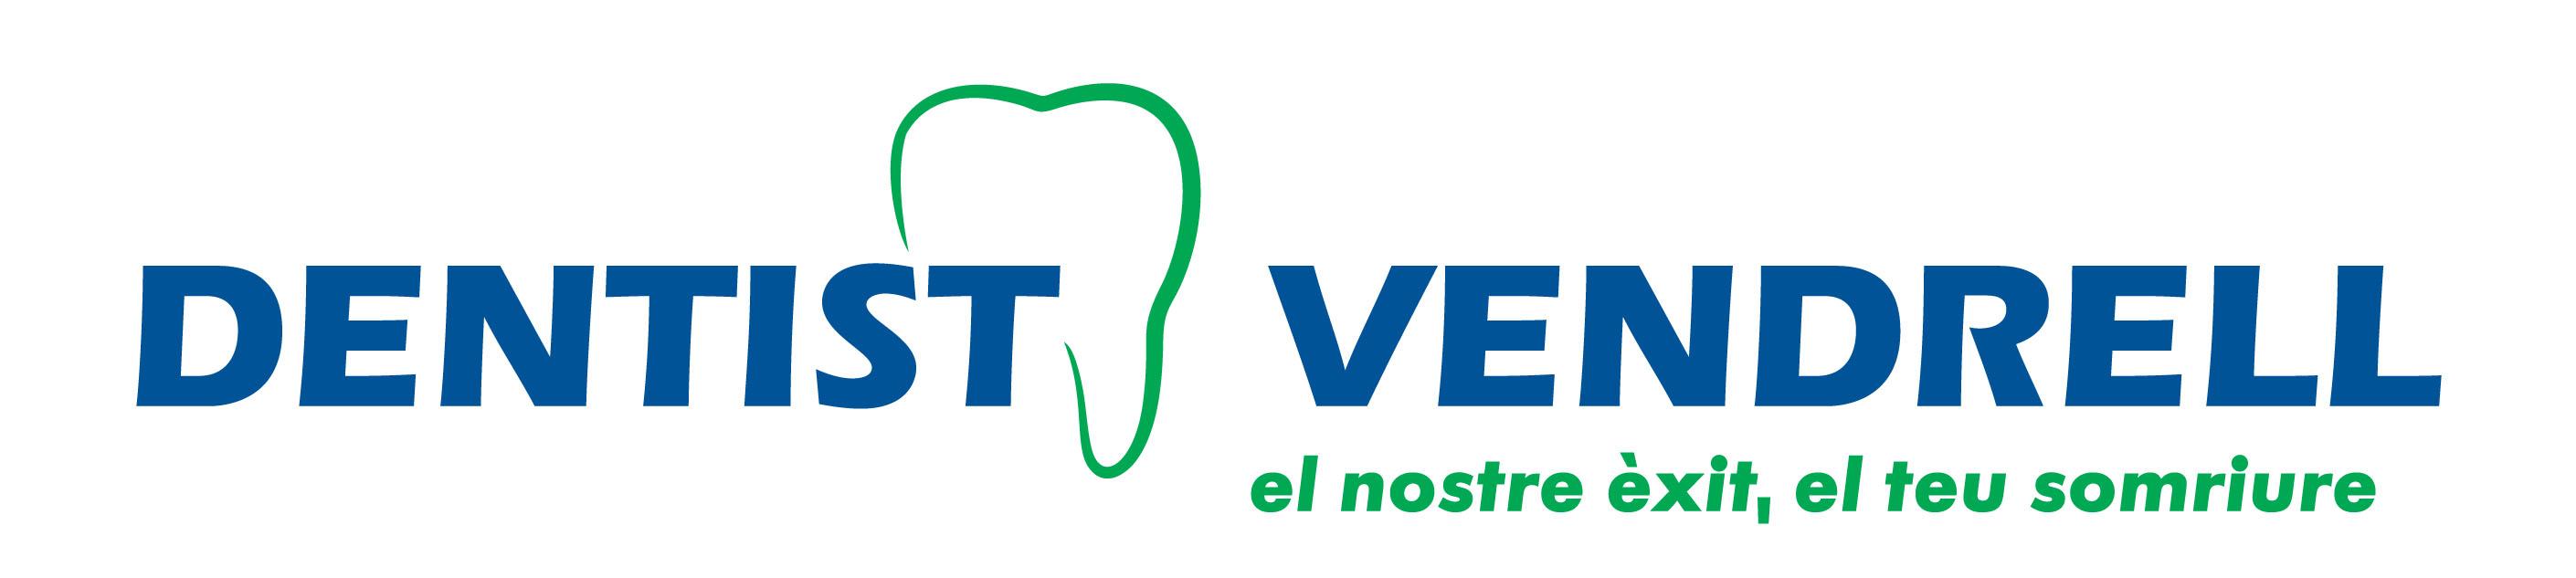 Dentist Vendrell